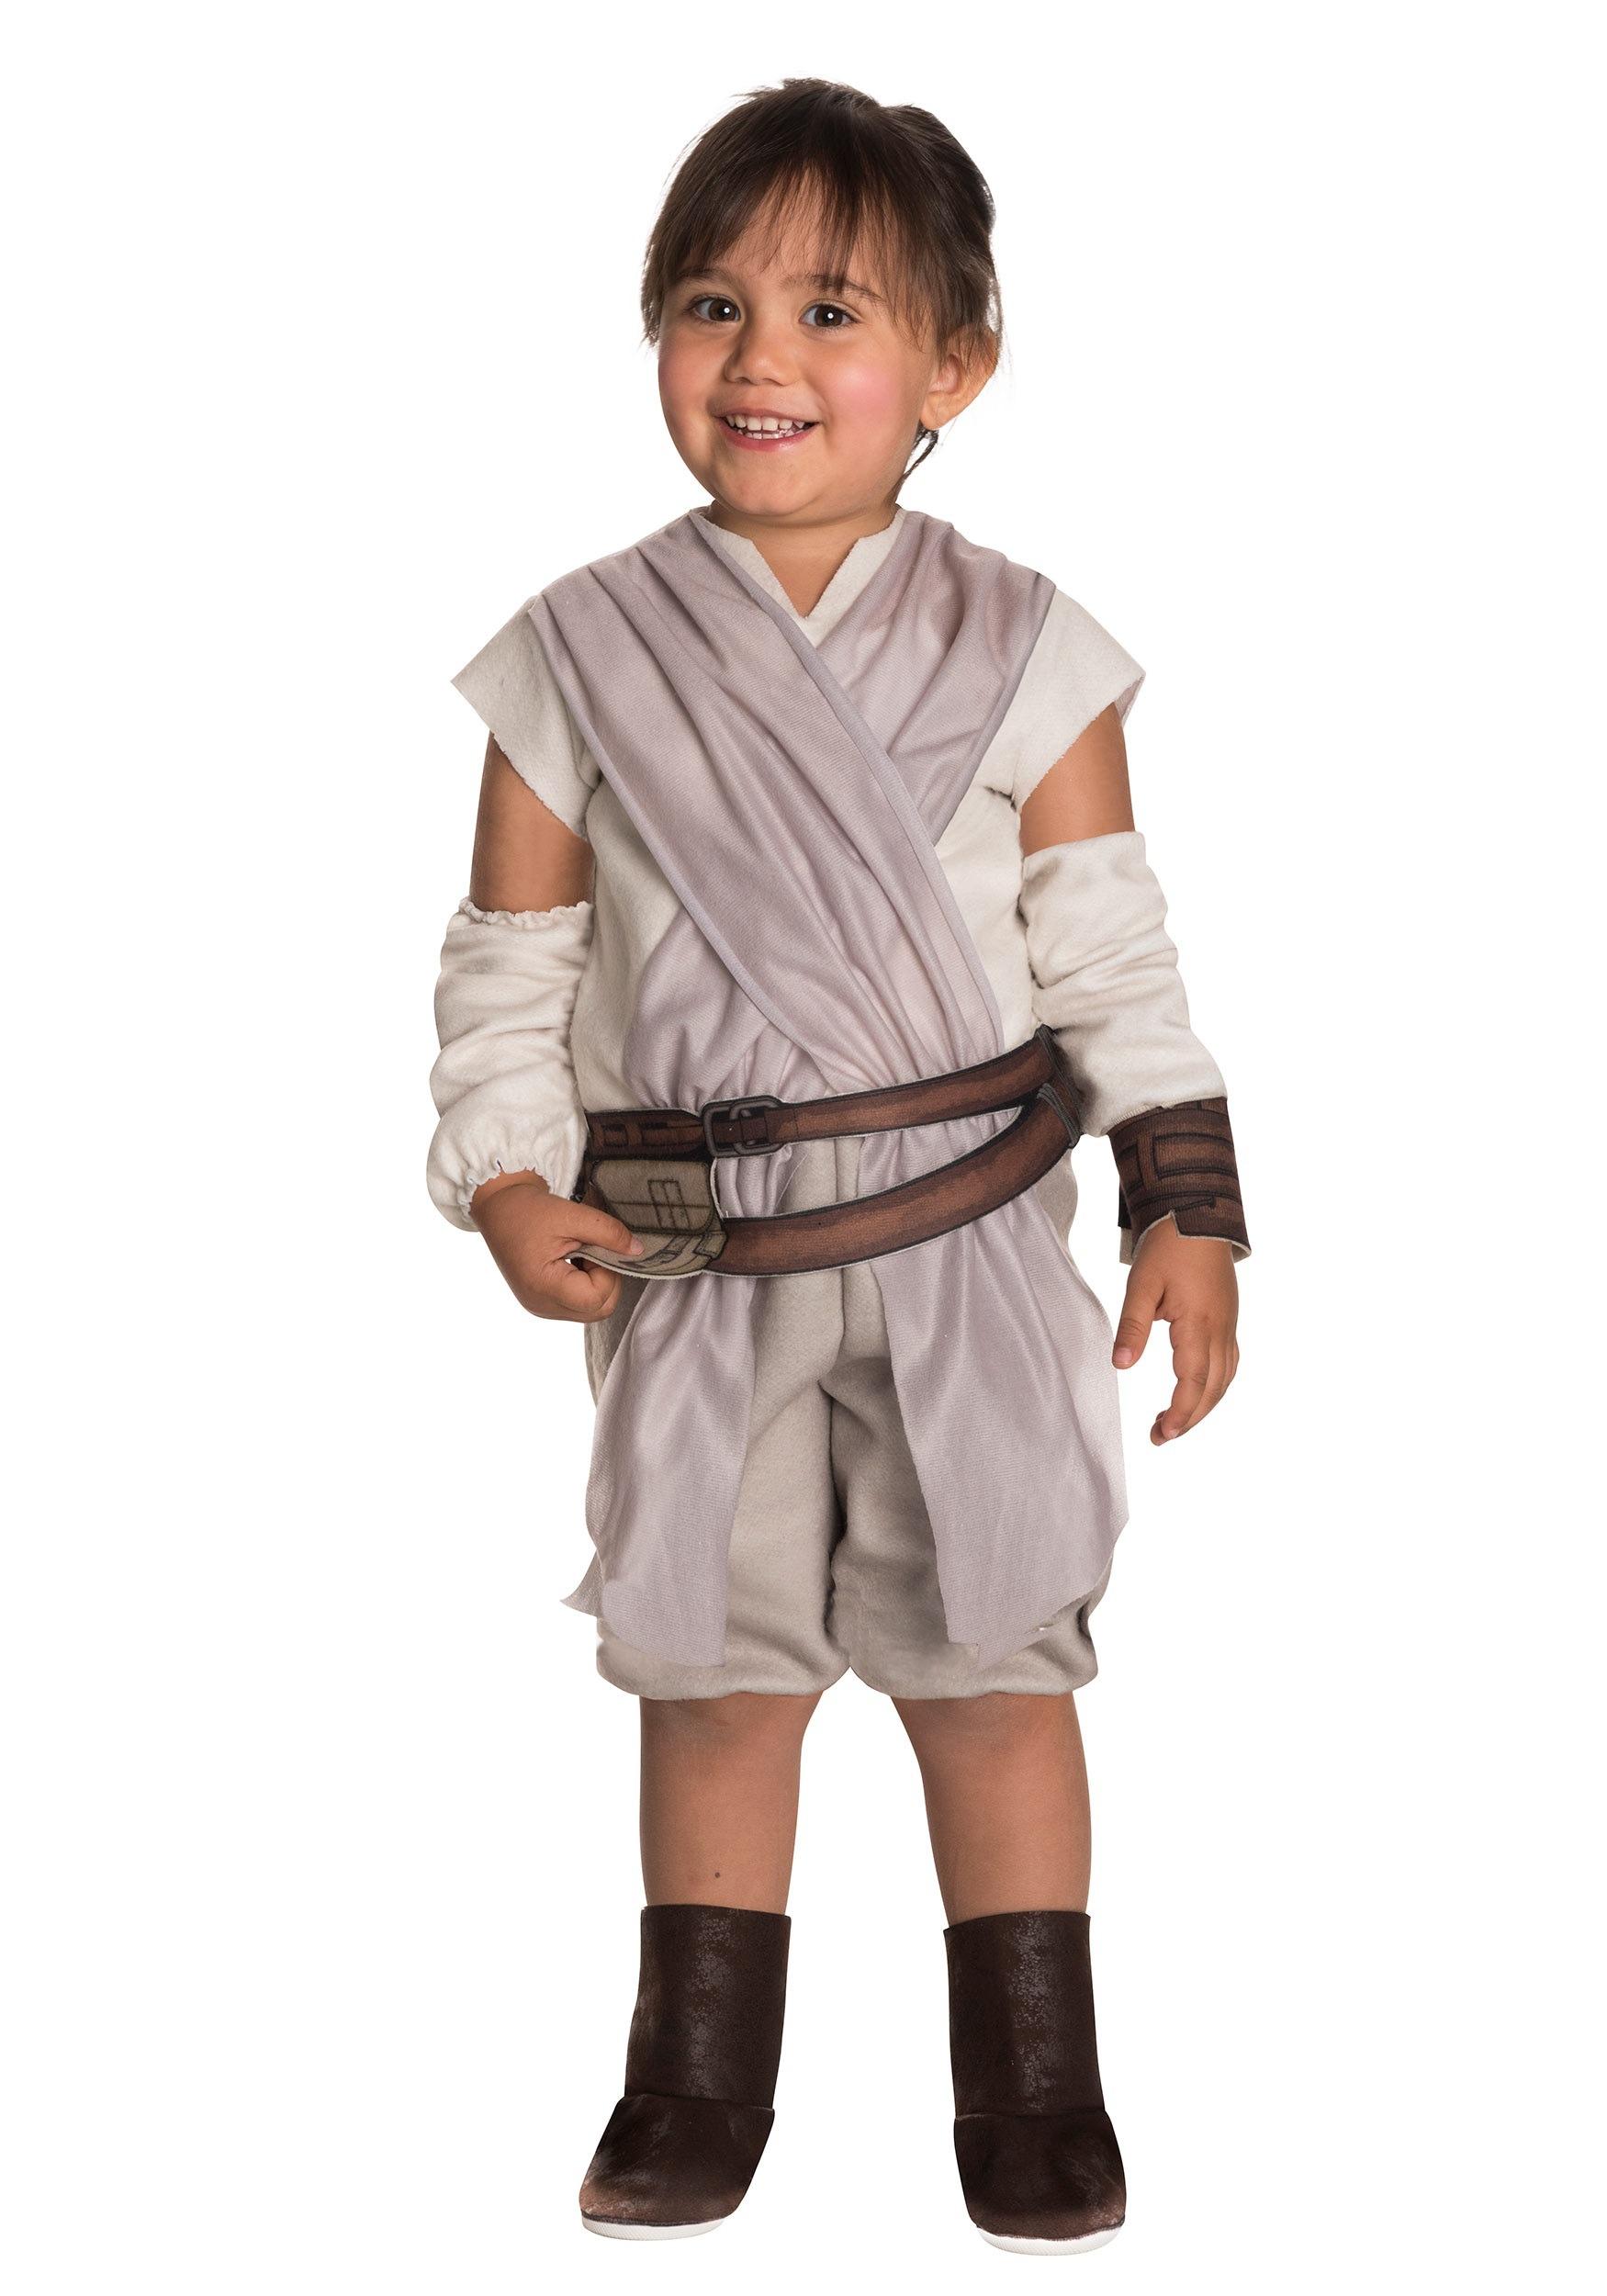 Kids Star Wars Costumes - Child, Toddler Halloween Costume